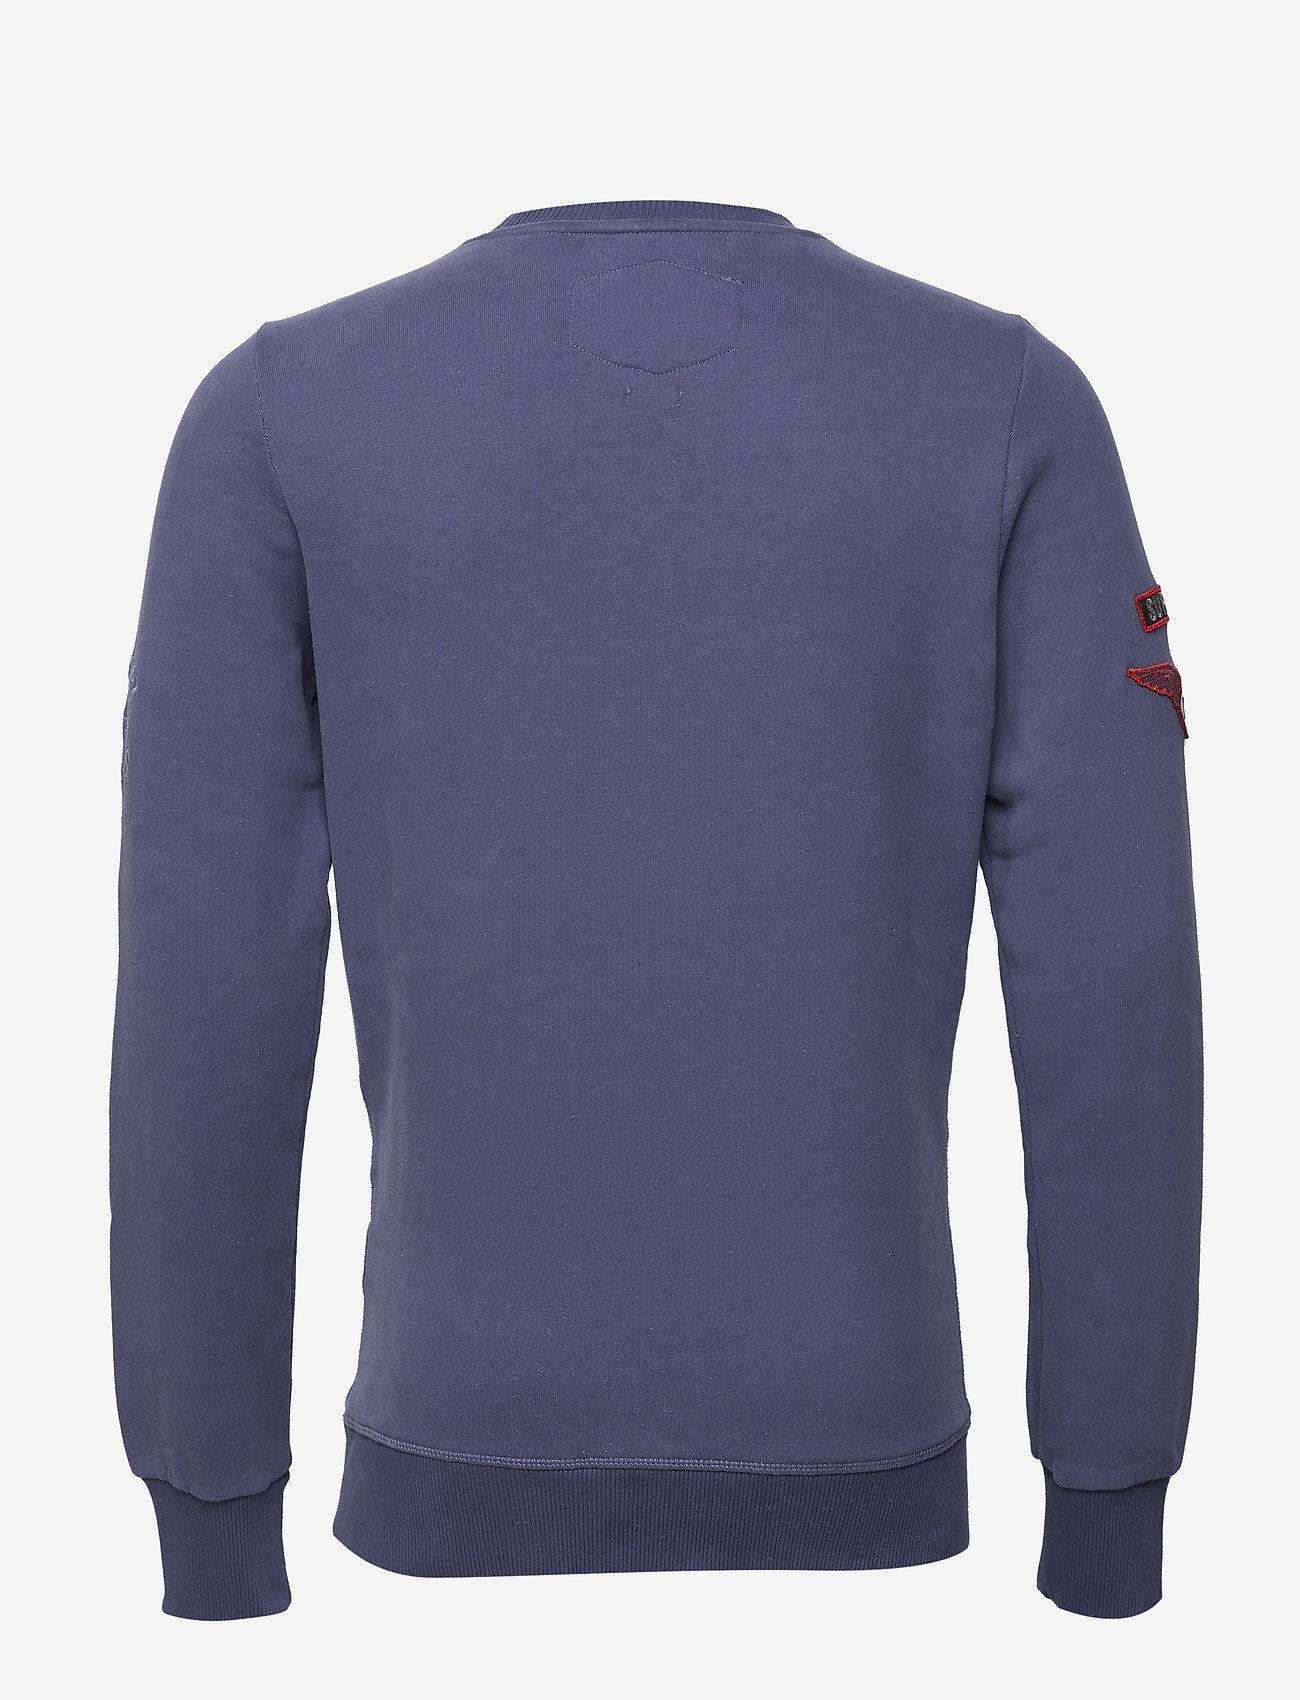 Superdrycustom 1334 Crew - Sweatshirts